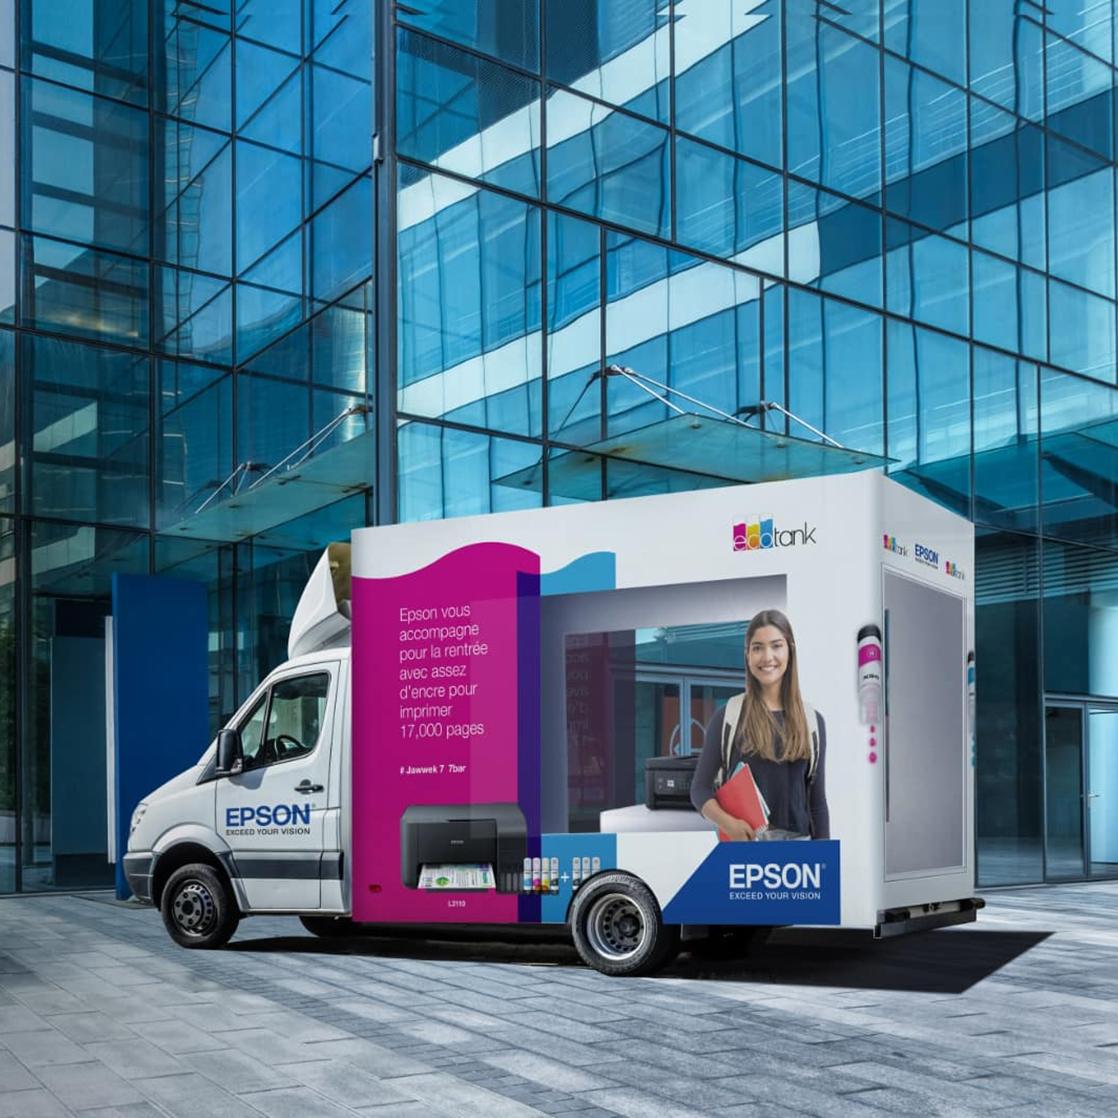 Epson - EcoTank Truck Billboard Campaign